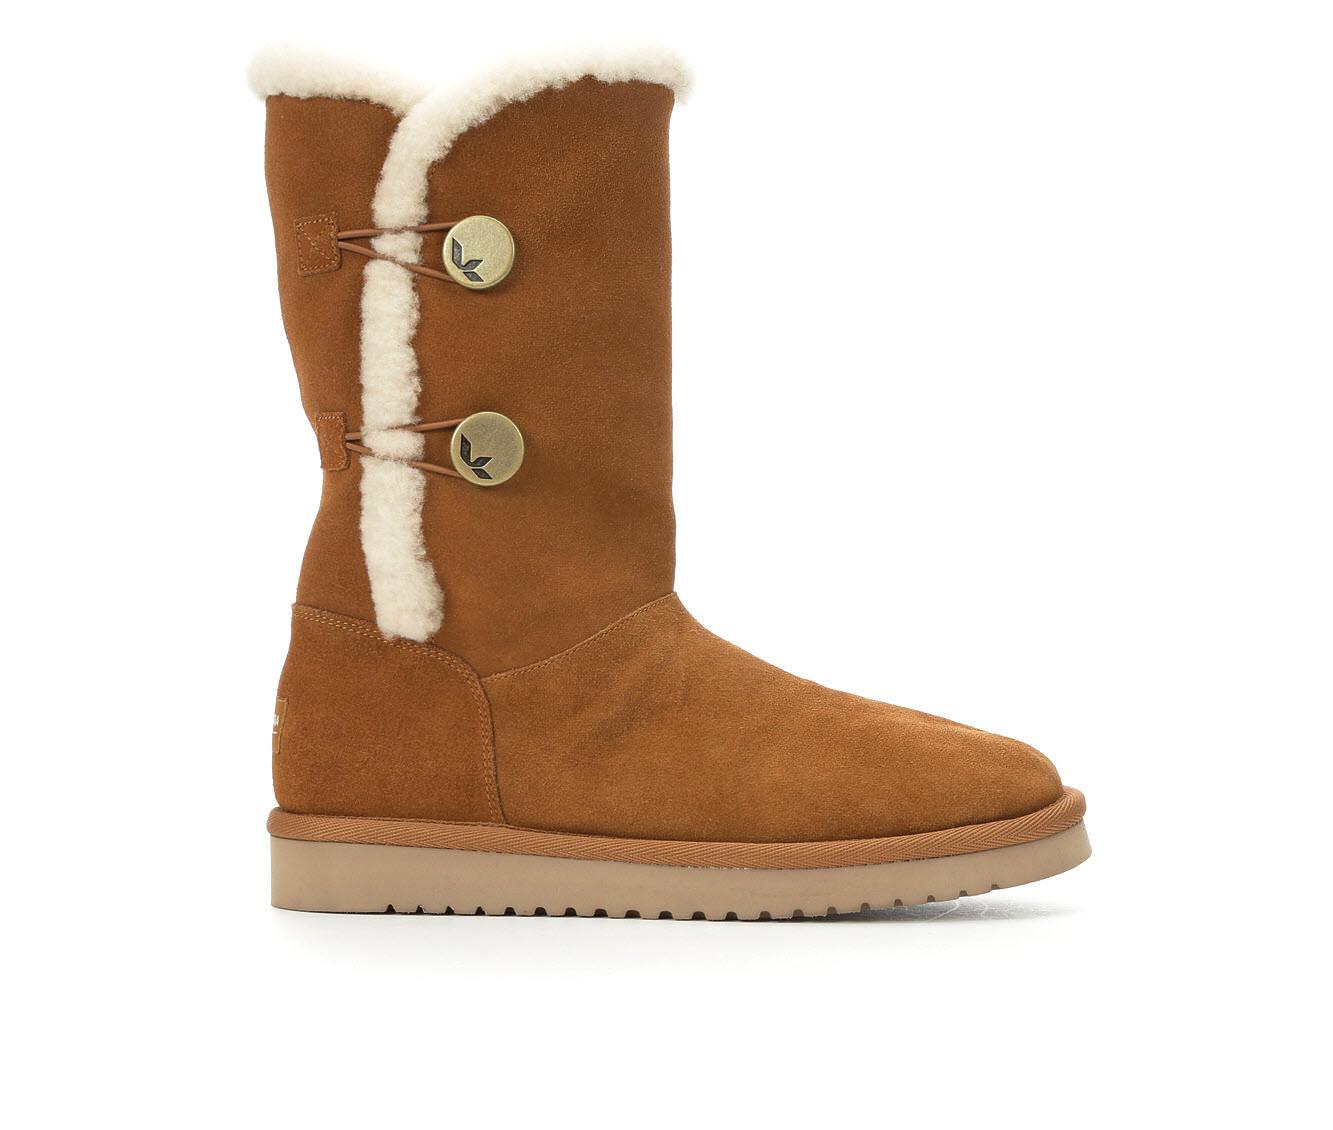 great discount Women's Koolaburra by UGG Kinslei Tall Boots Chestnut